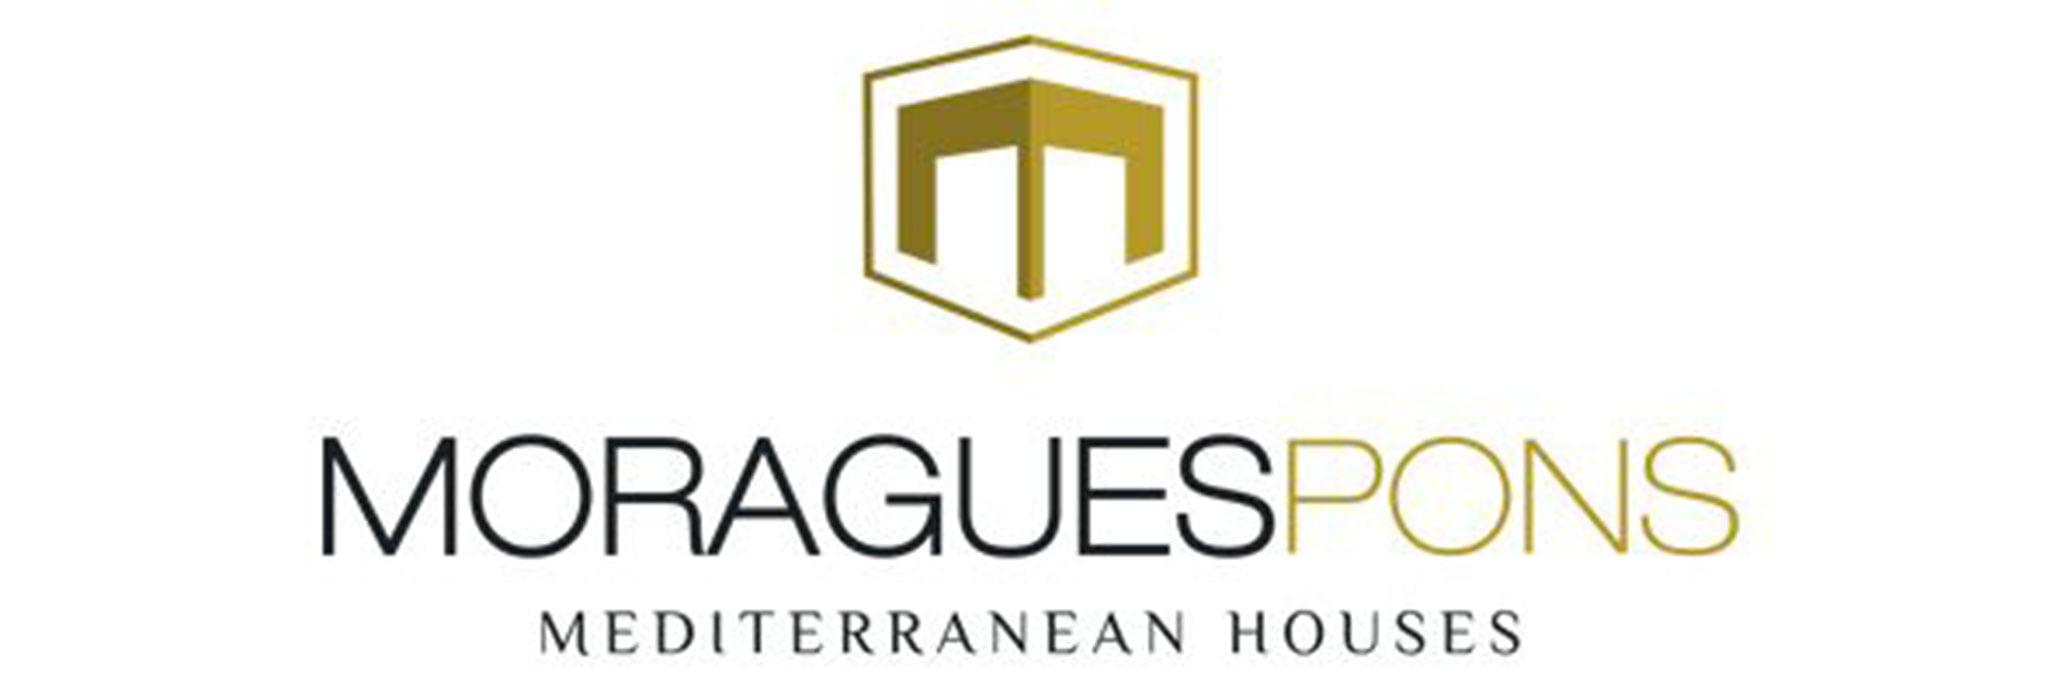 Logotipo MORAGUESPONS Mediterranean Houses